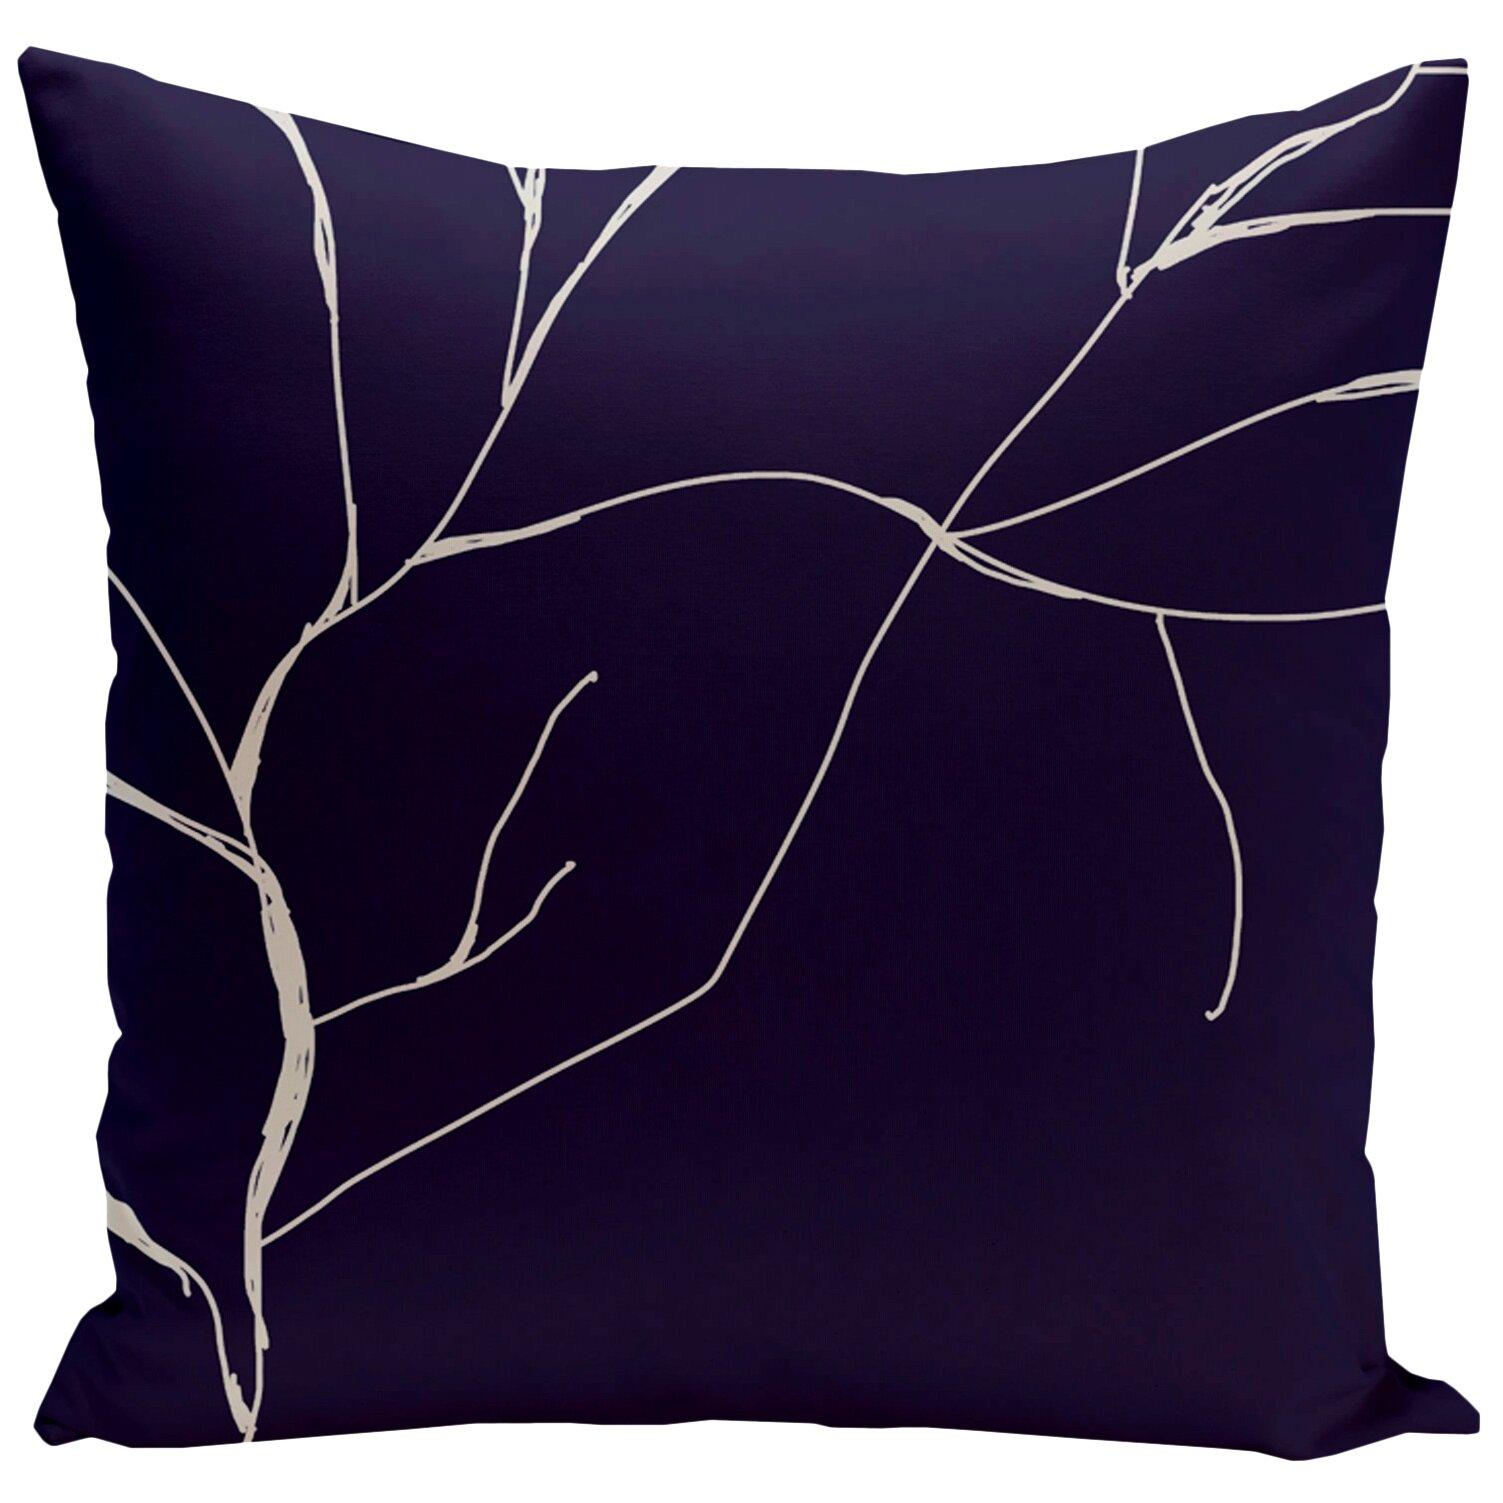 e by design Floral Polyester Throw Pillow & Reviews Wayfair